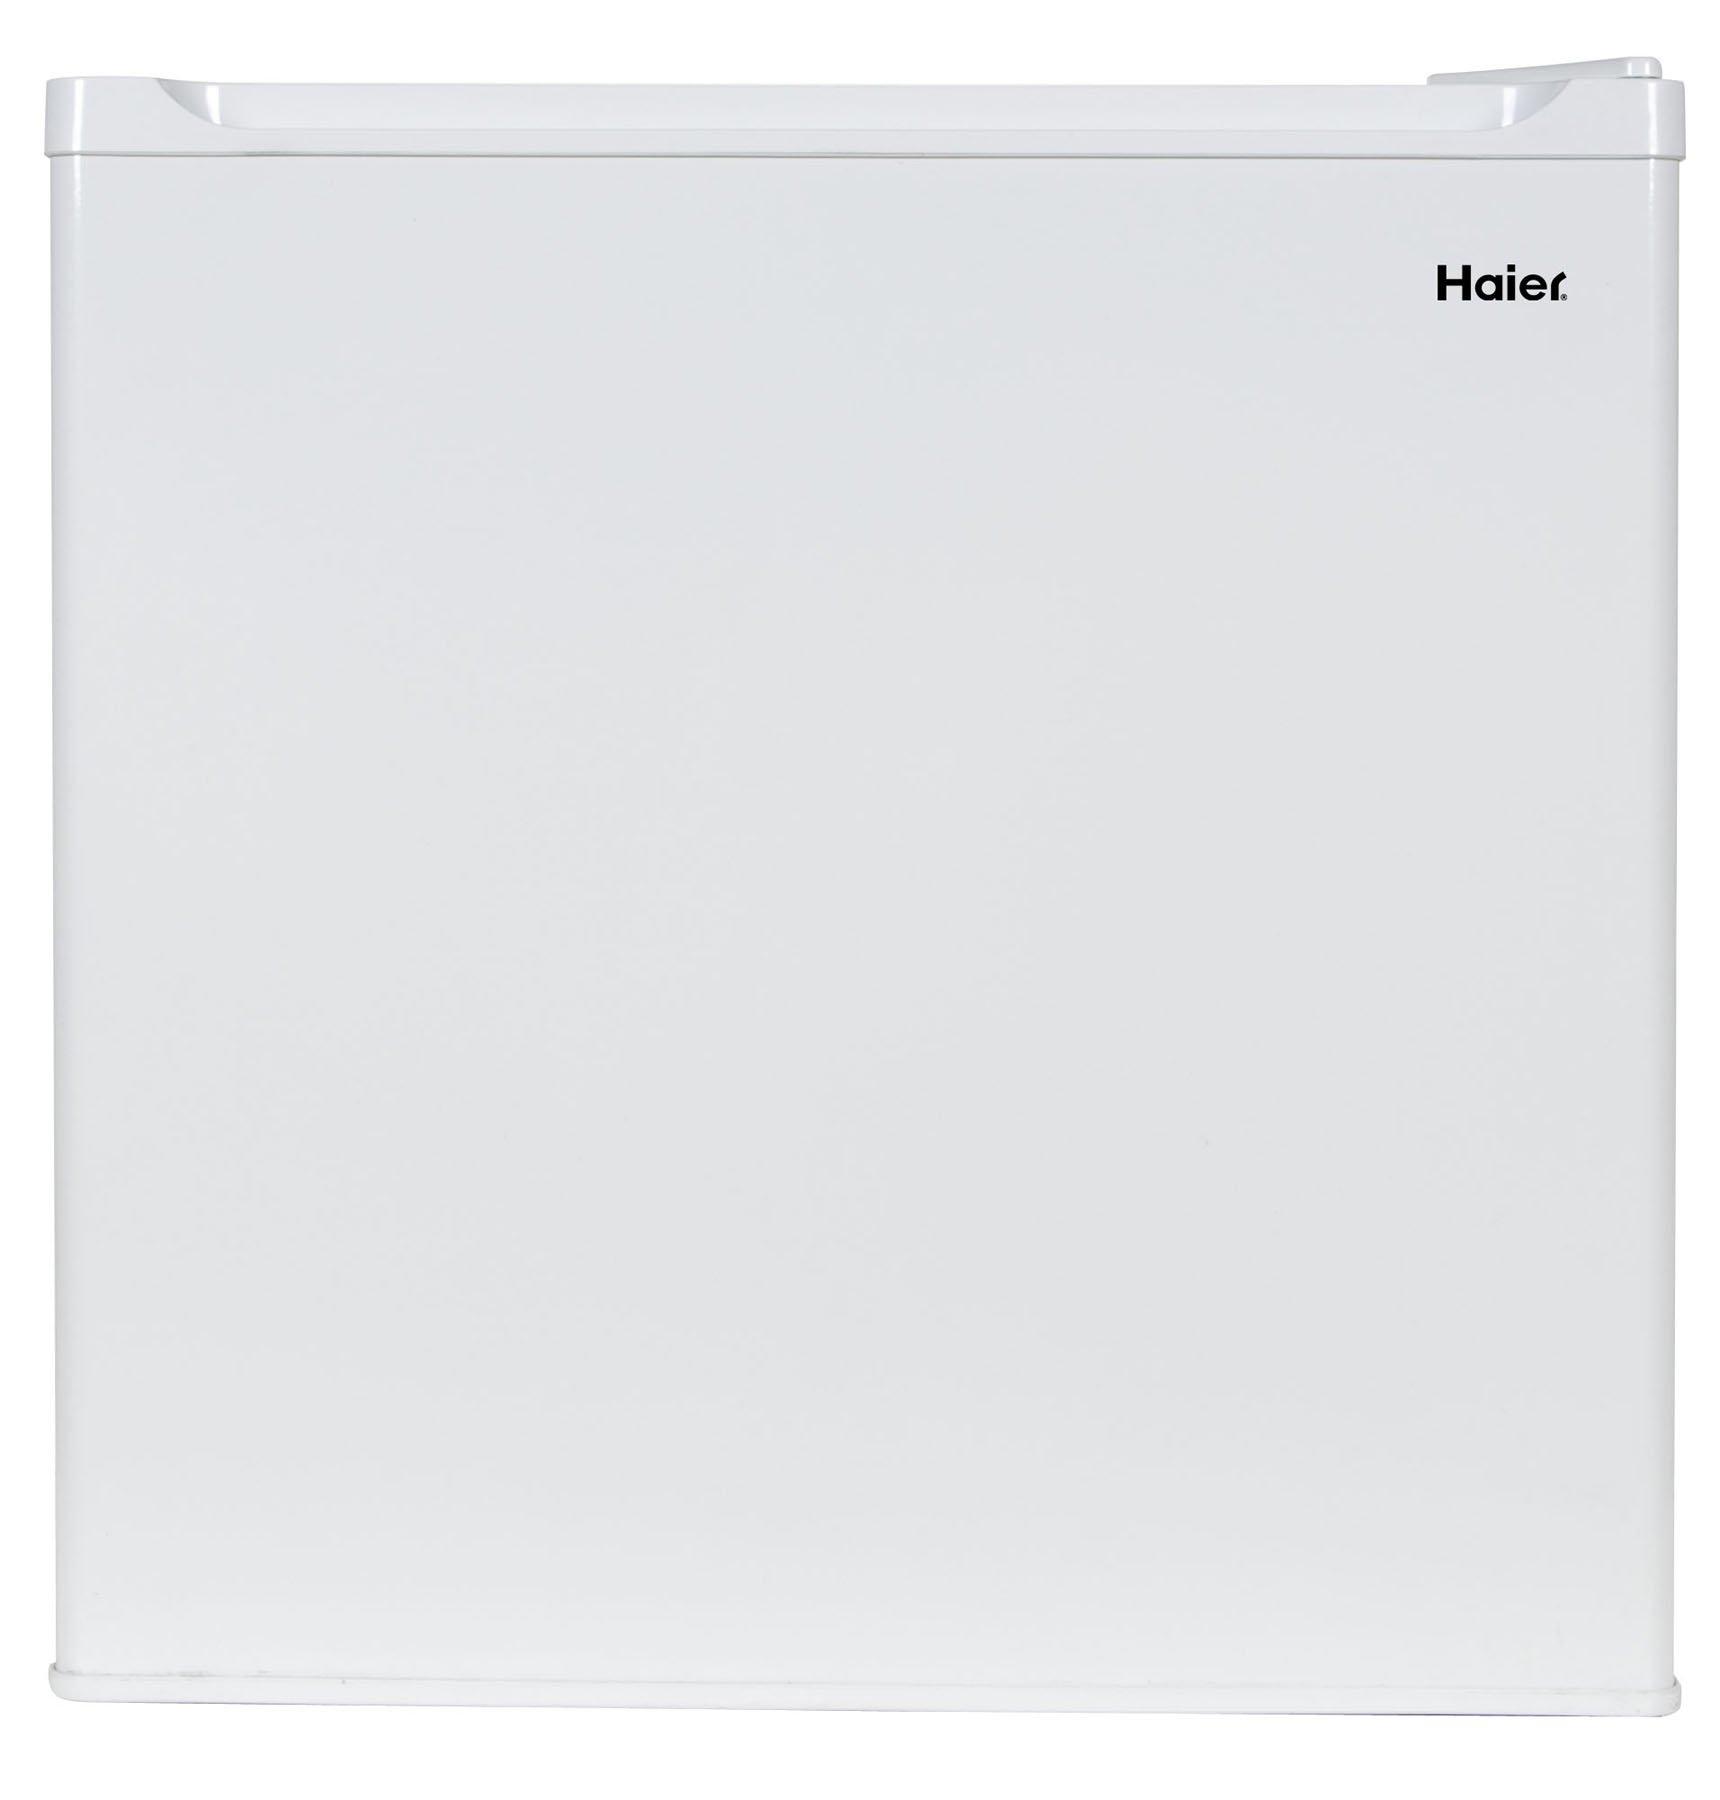 Haier HC17SF15RW 1.7 Cubic Feet Refrigerator/Freezer, Energy Star Qualified, White